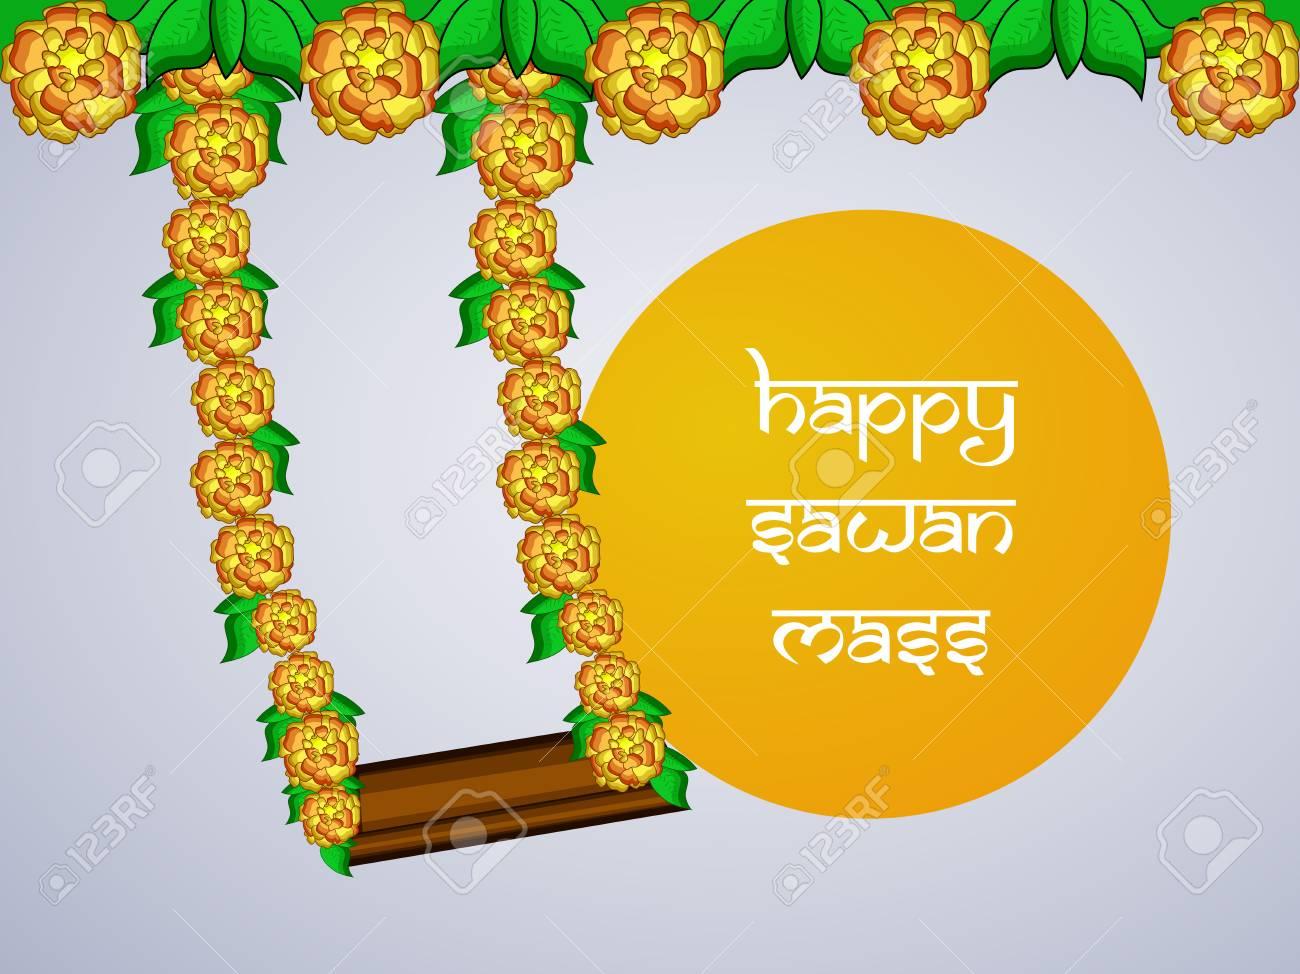 Illustration of background for Hindi Festival Sawan